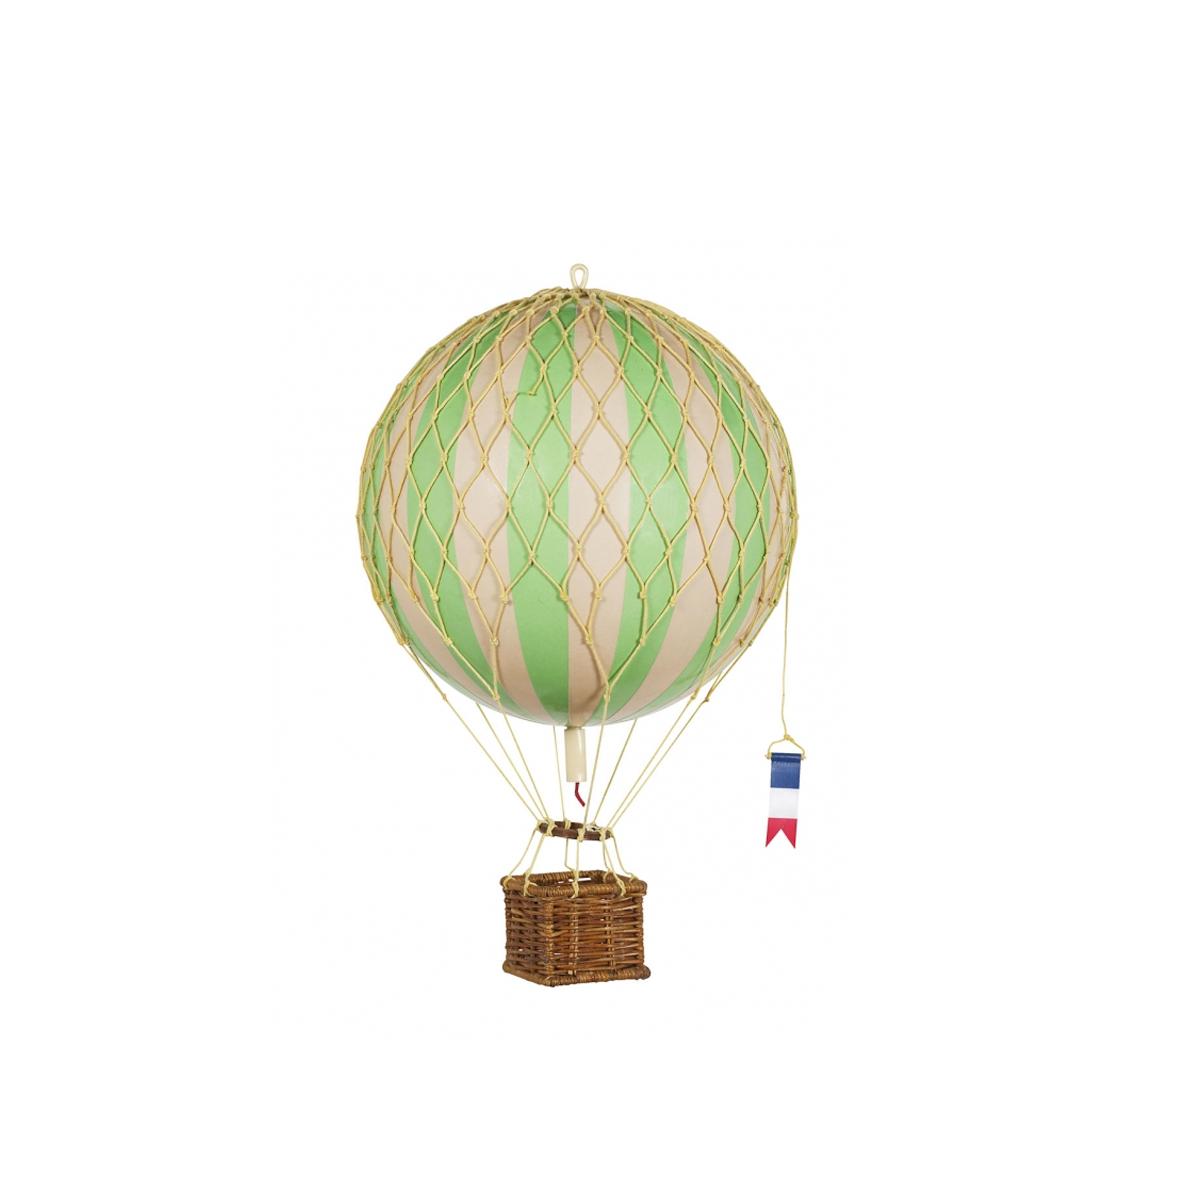 Image of Authentic Models luftballon 8,5 cm - grøn